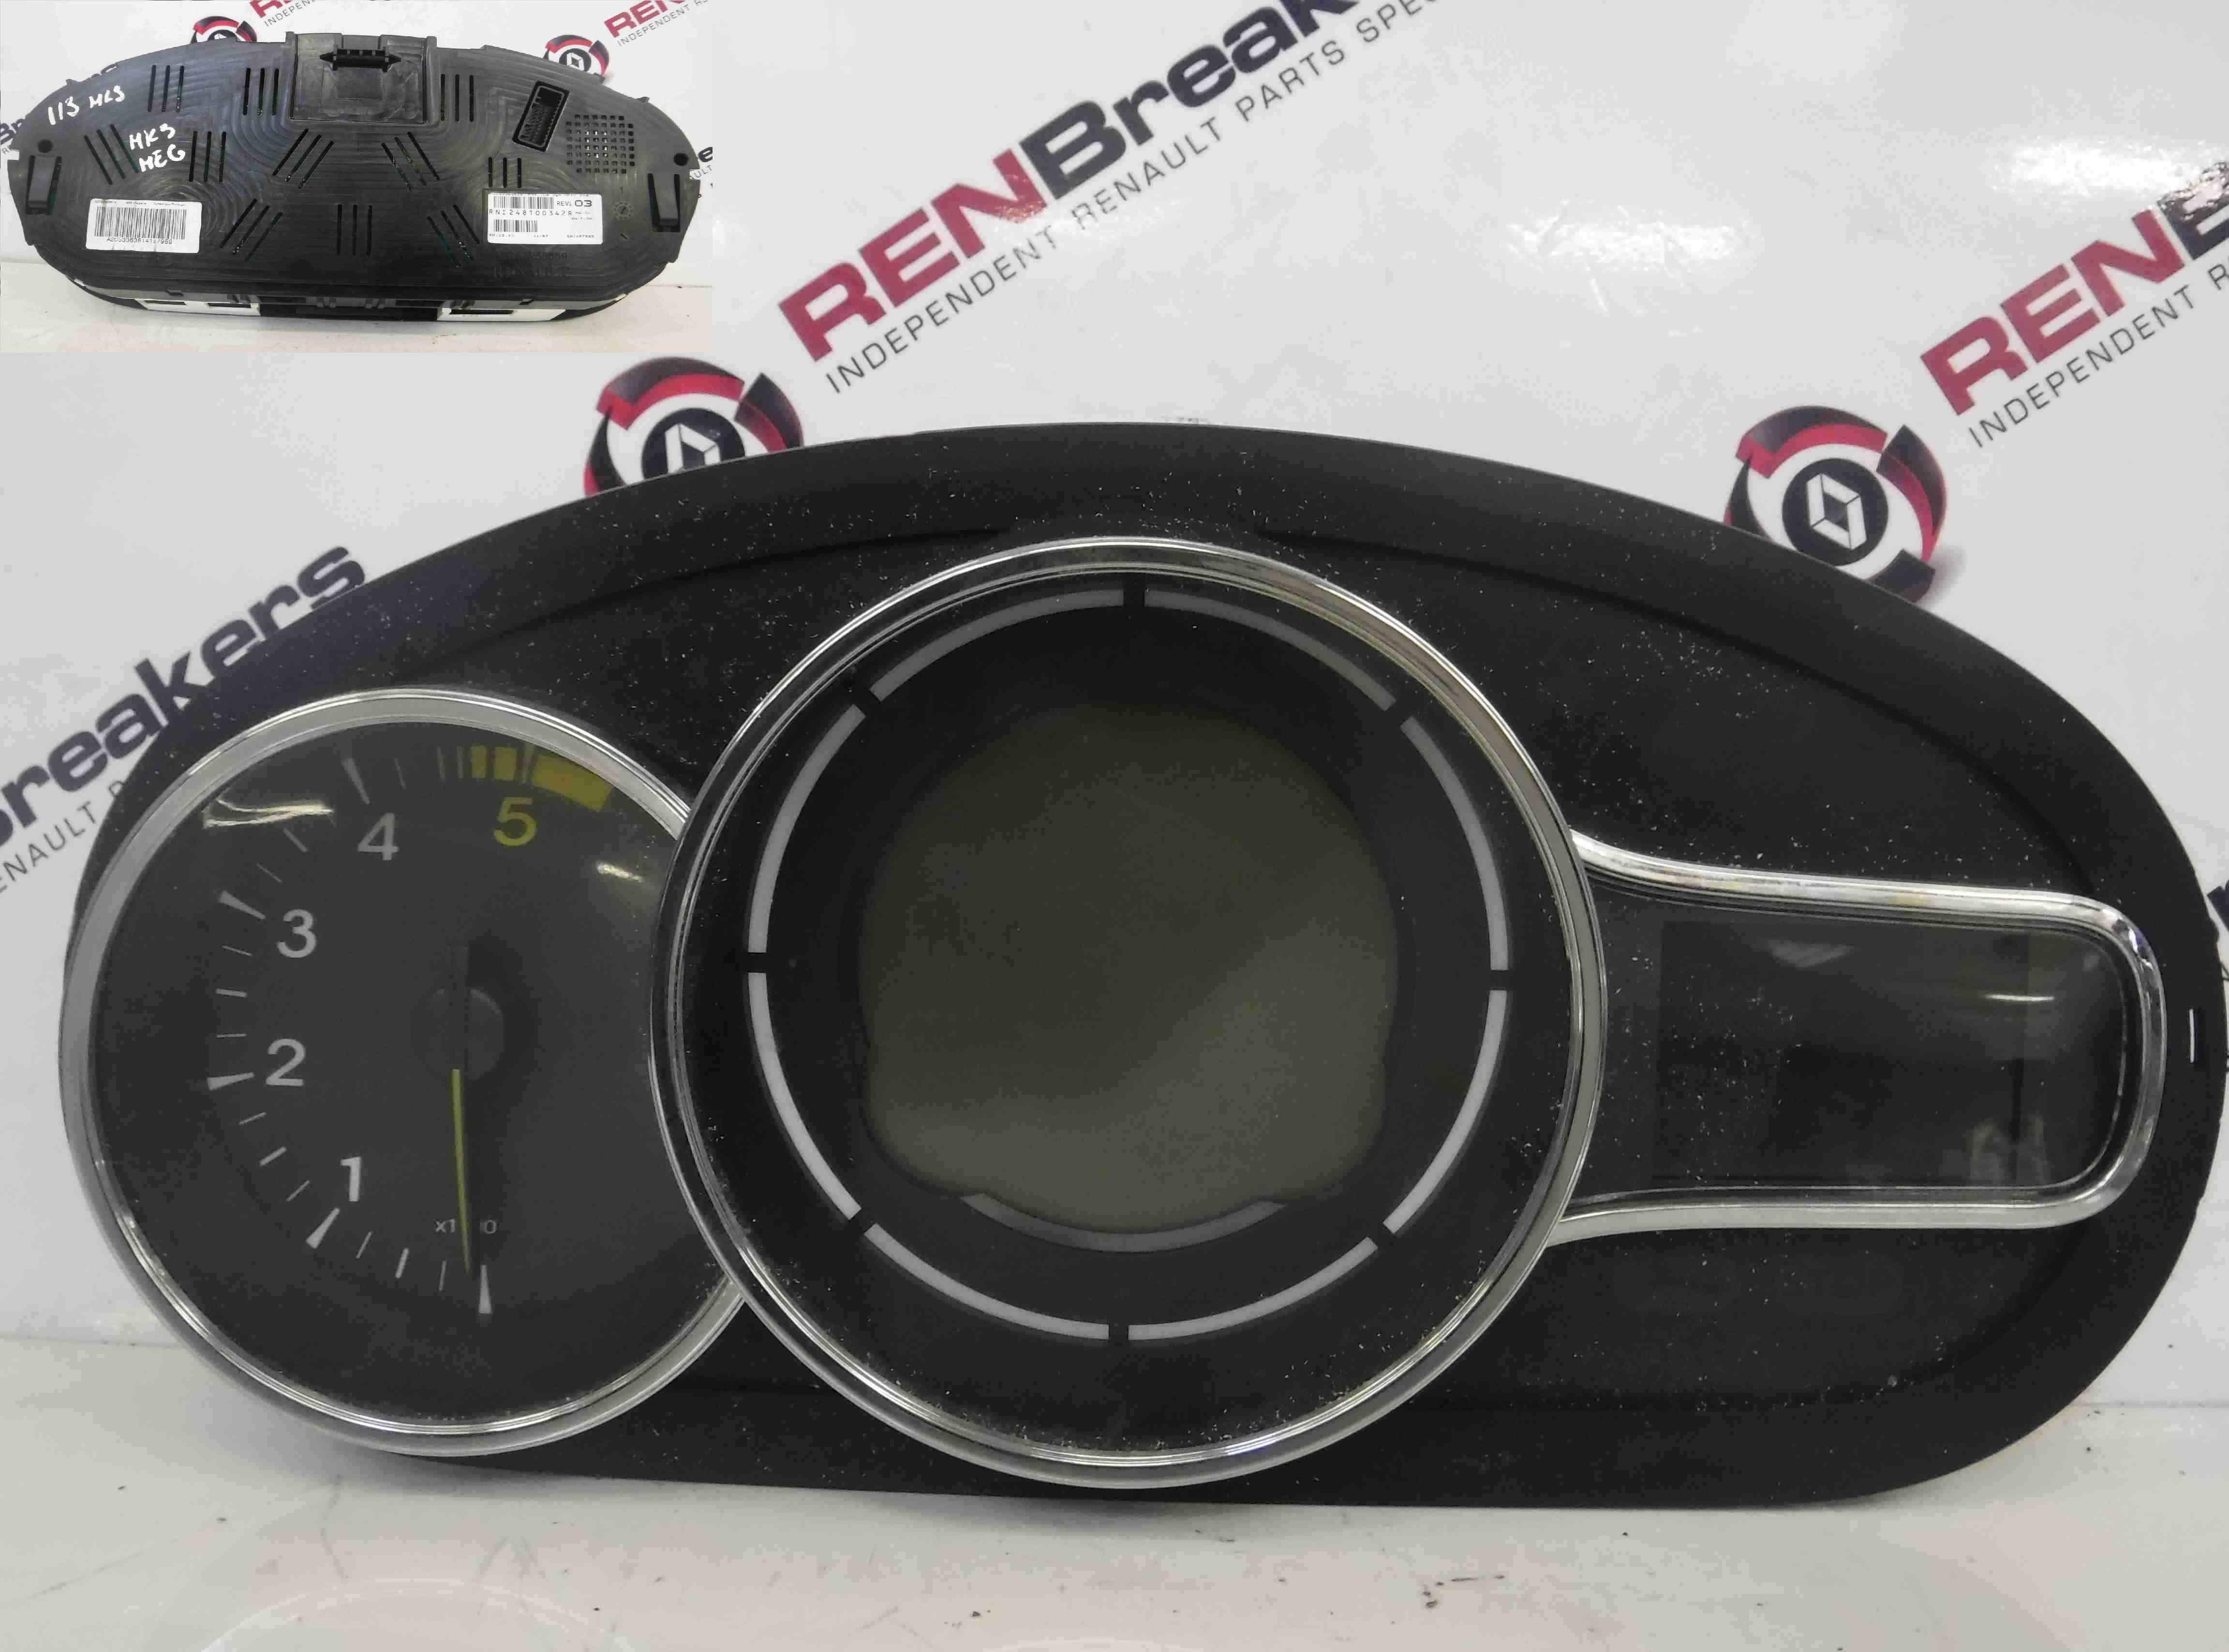 Renault Megane MK3 2008-2014 Instrument Panel Dashboard Clocks  248100342R